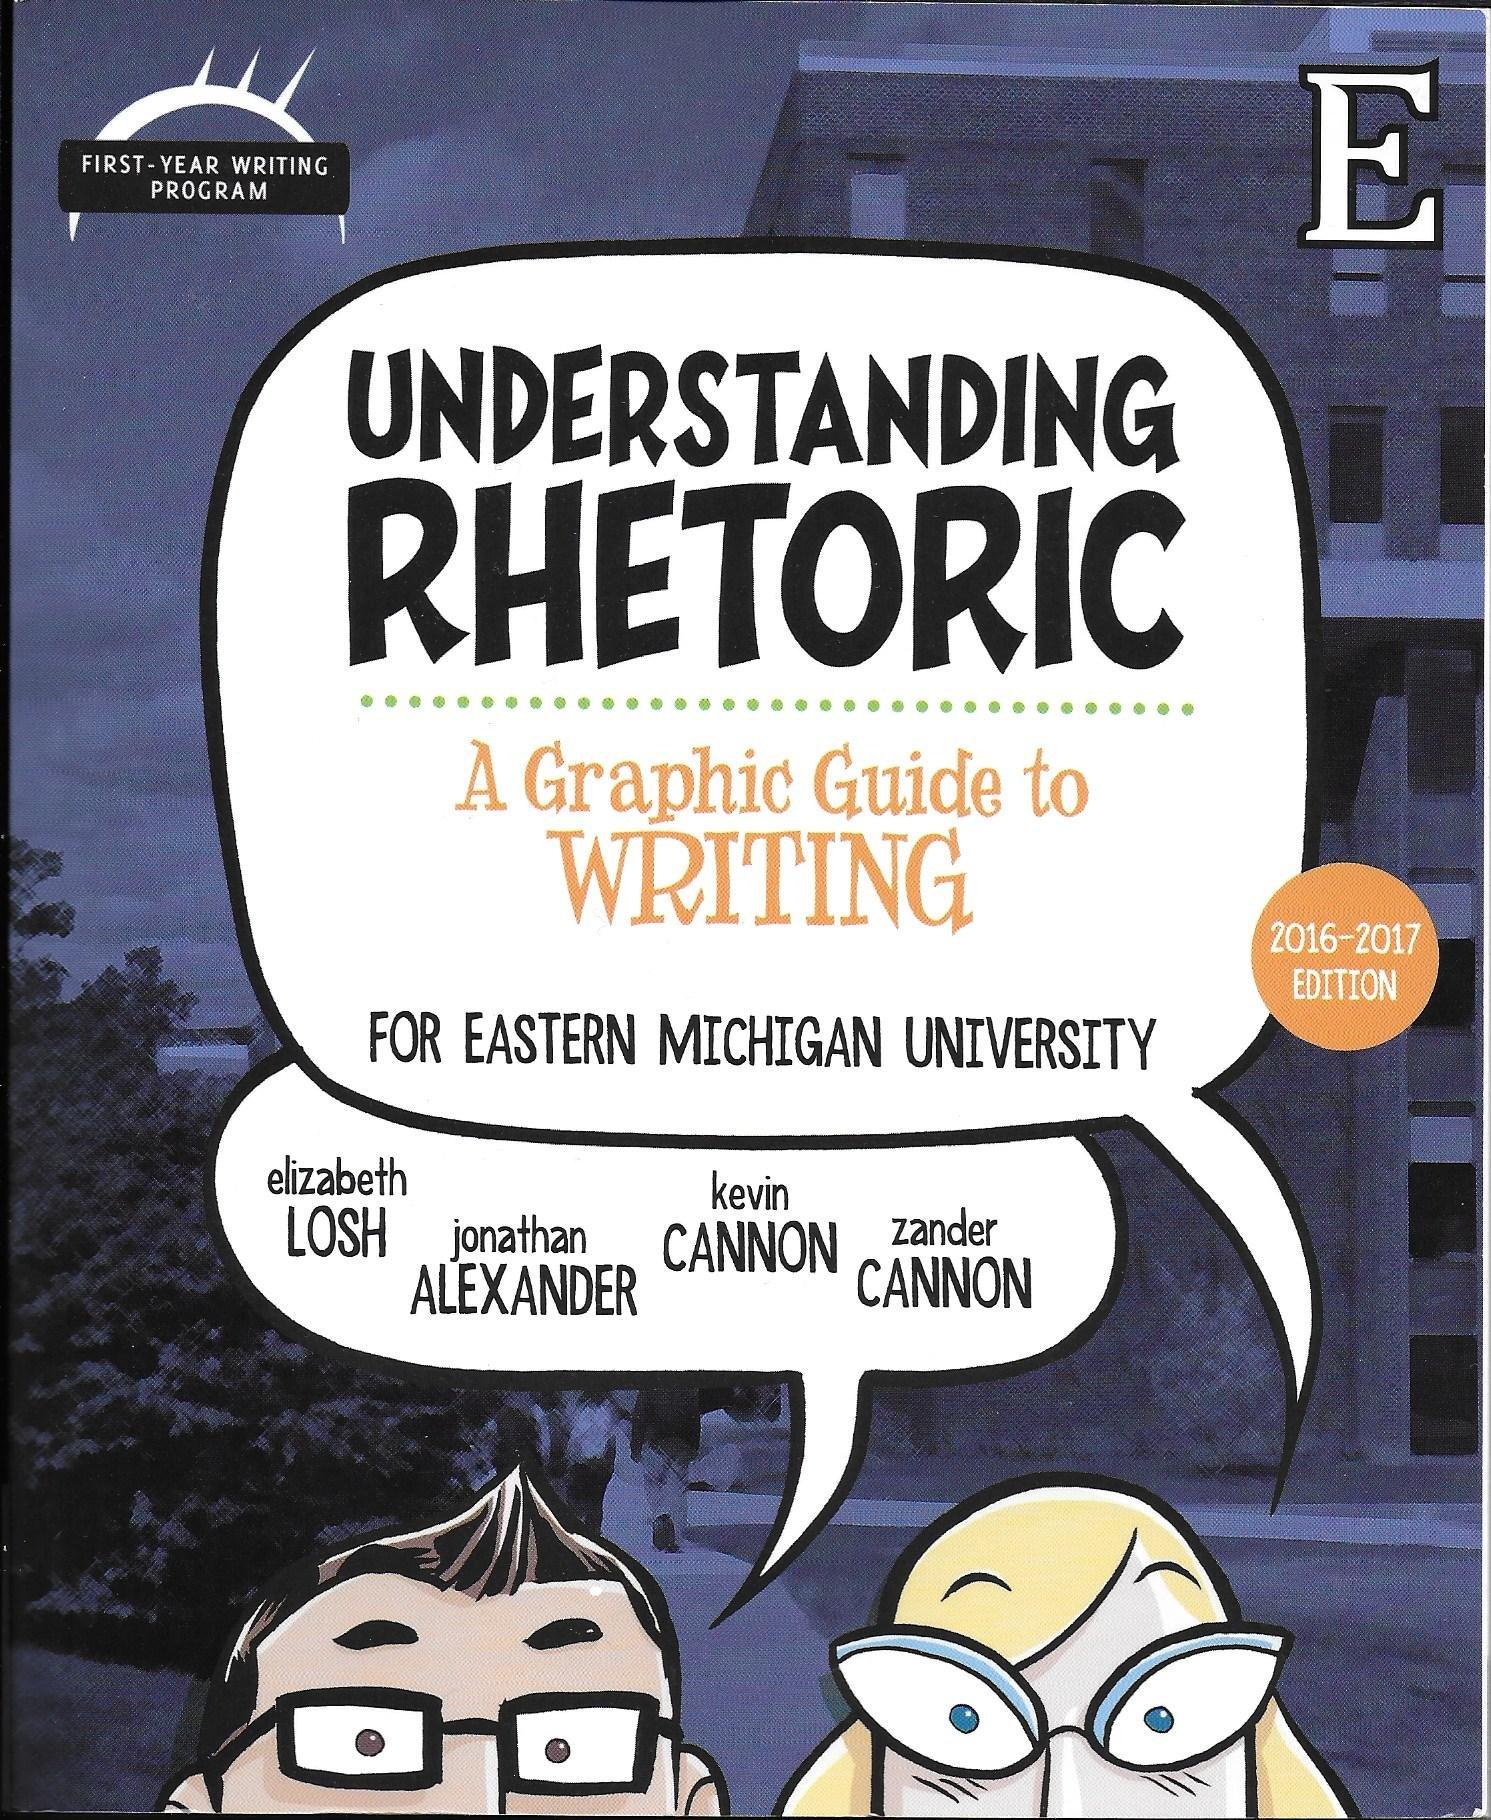 Understanding Rhetoric: A Graphic Guide to Writing, Eastern Michigan  University: Author: 9781319071356: Amazon.com: Books